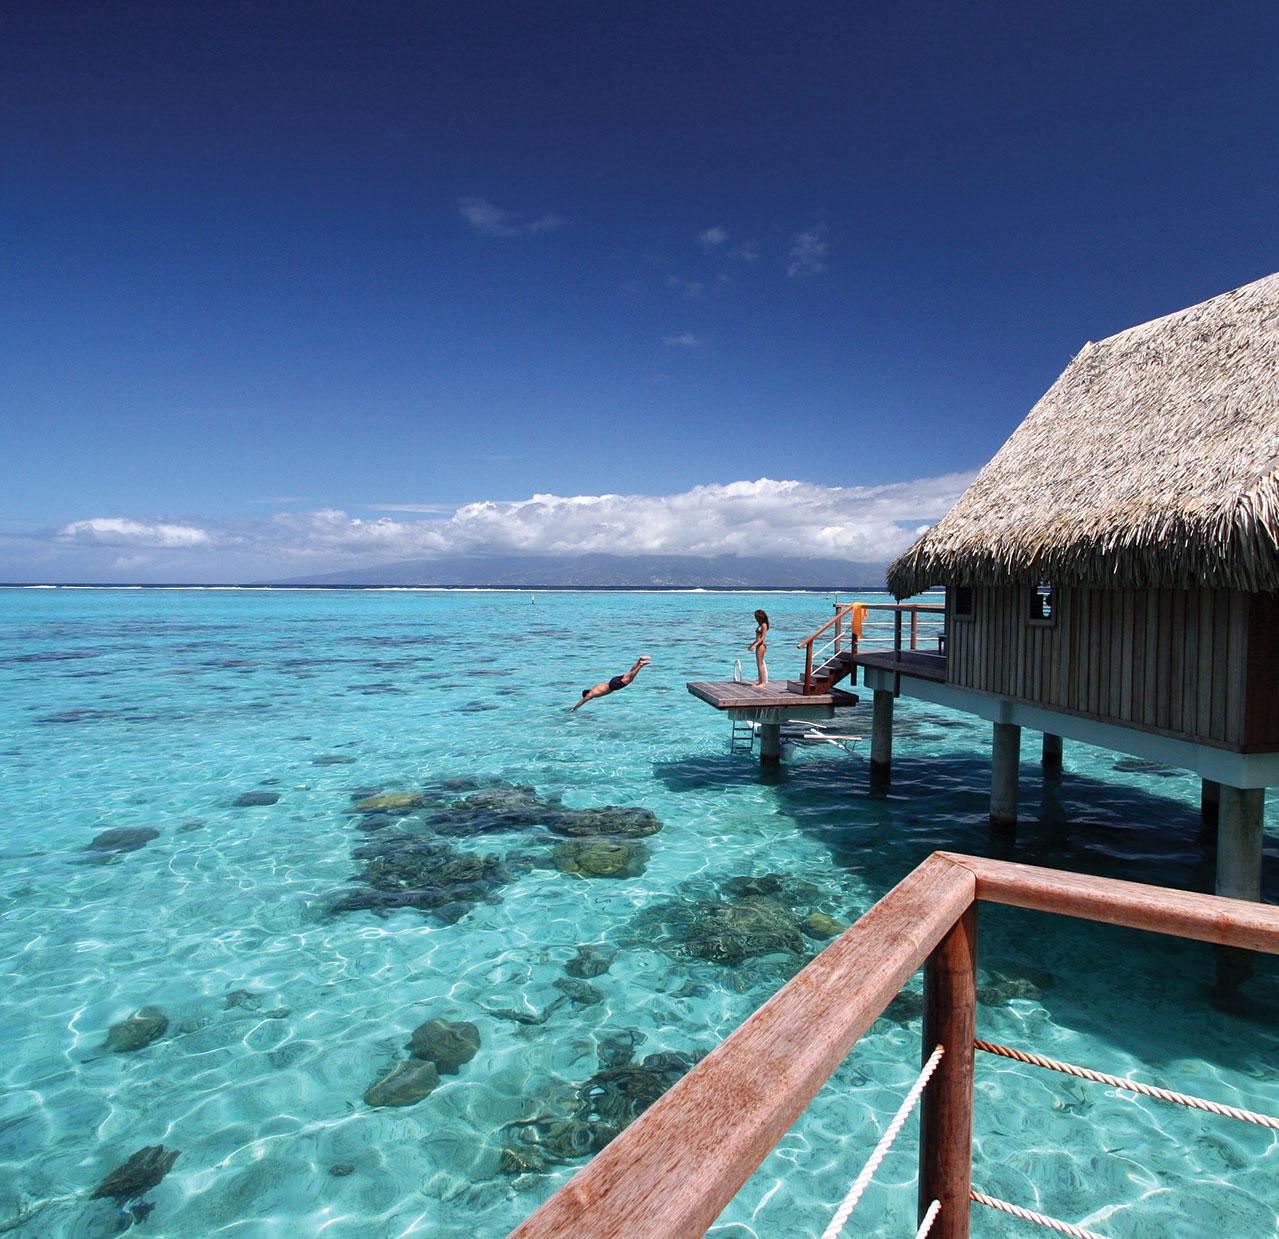 Sofitel Moorea Ia Ora Beach Resort The Tahiti Traveler